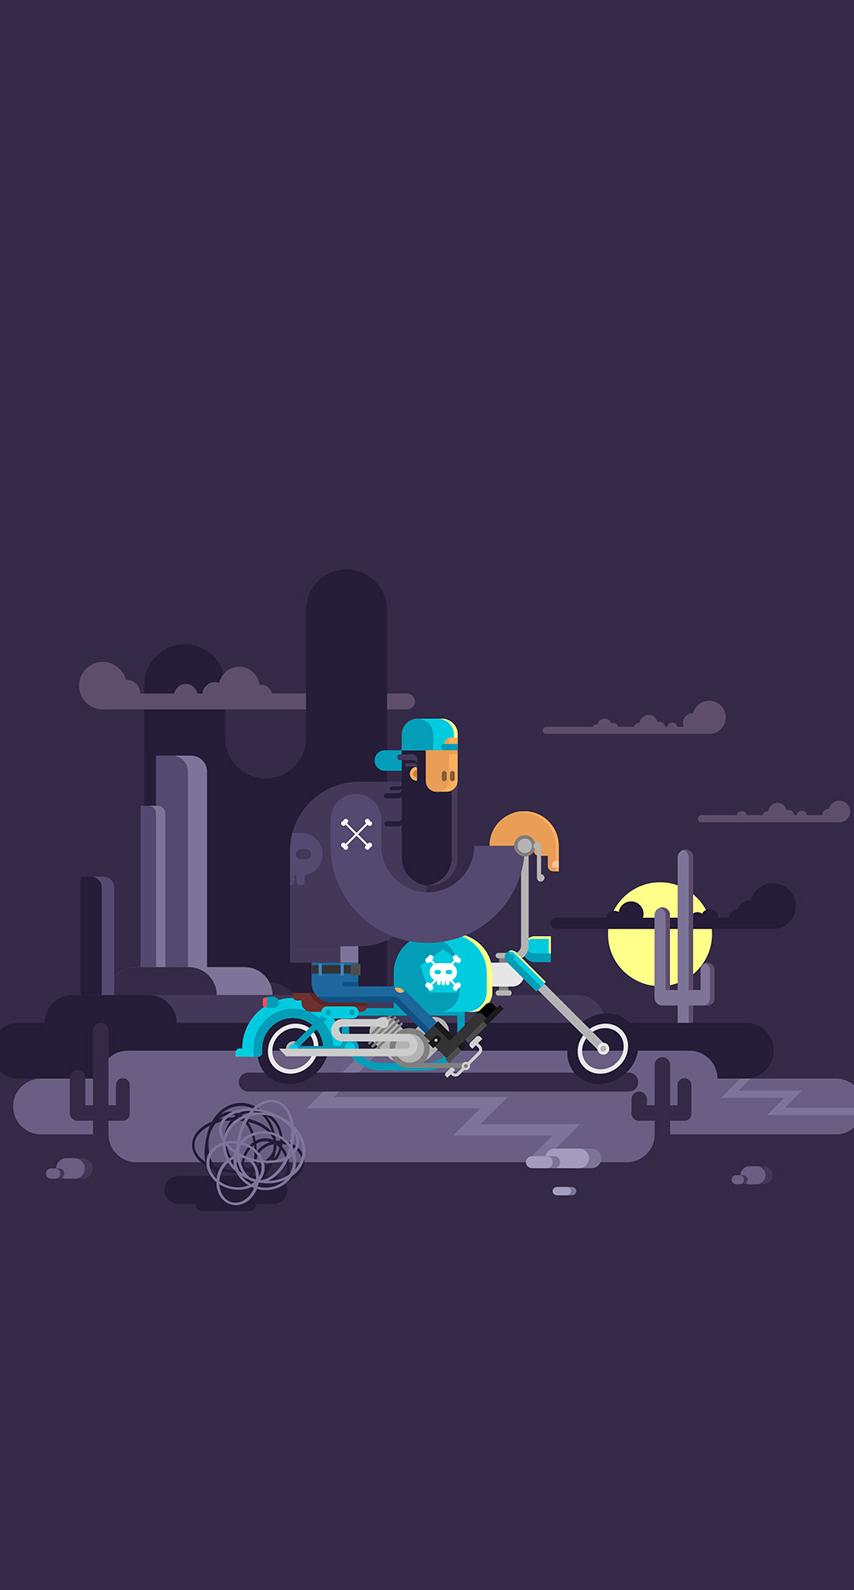 transportation system, vehicle